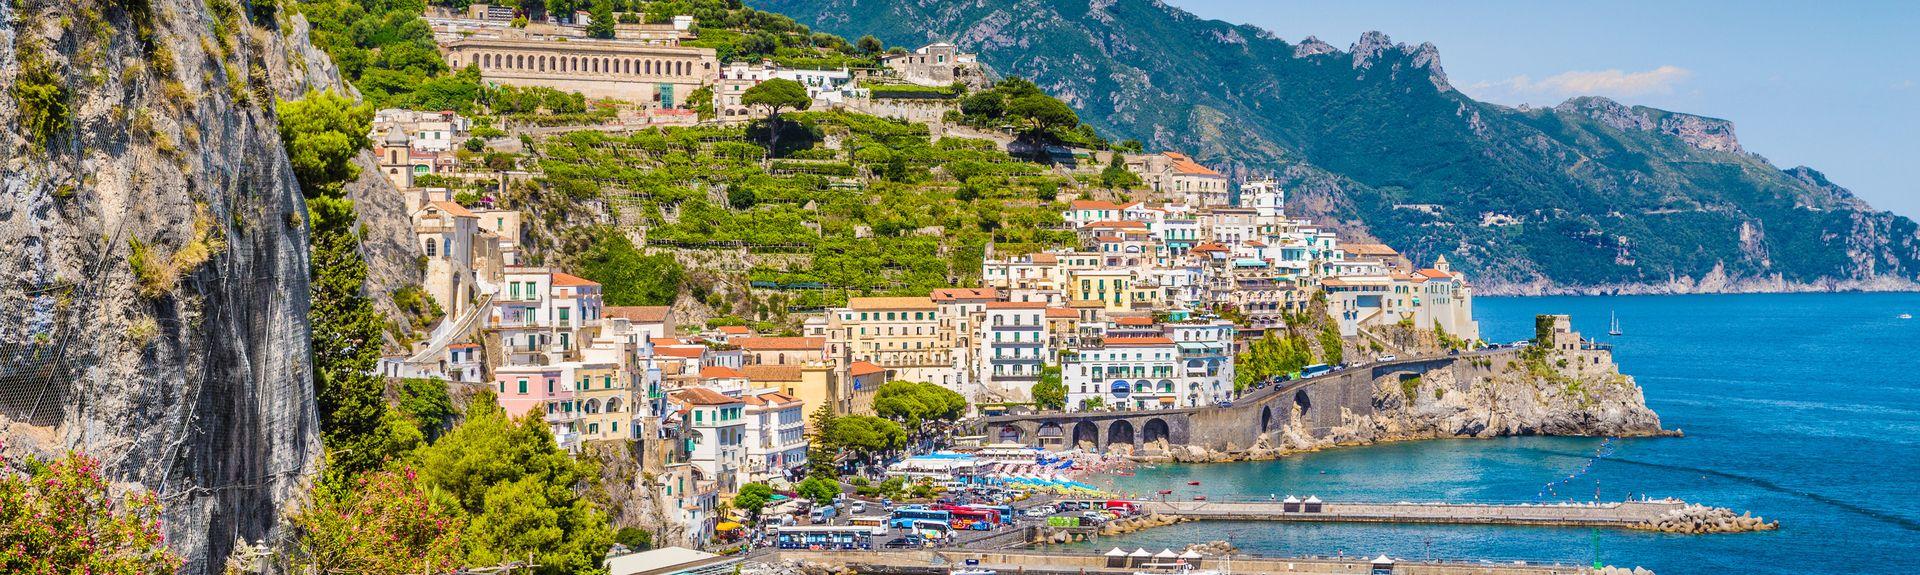 Campania, Italien